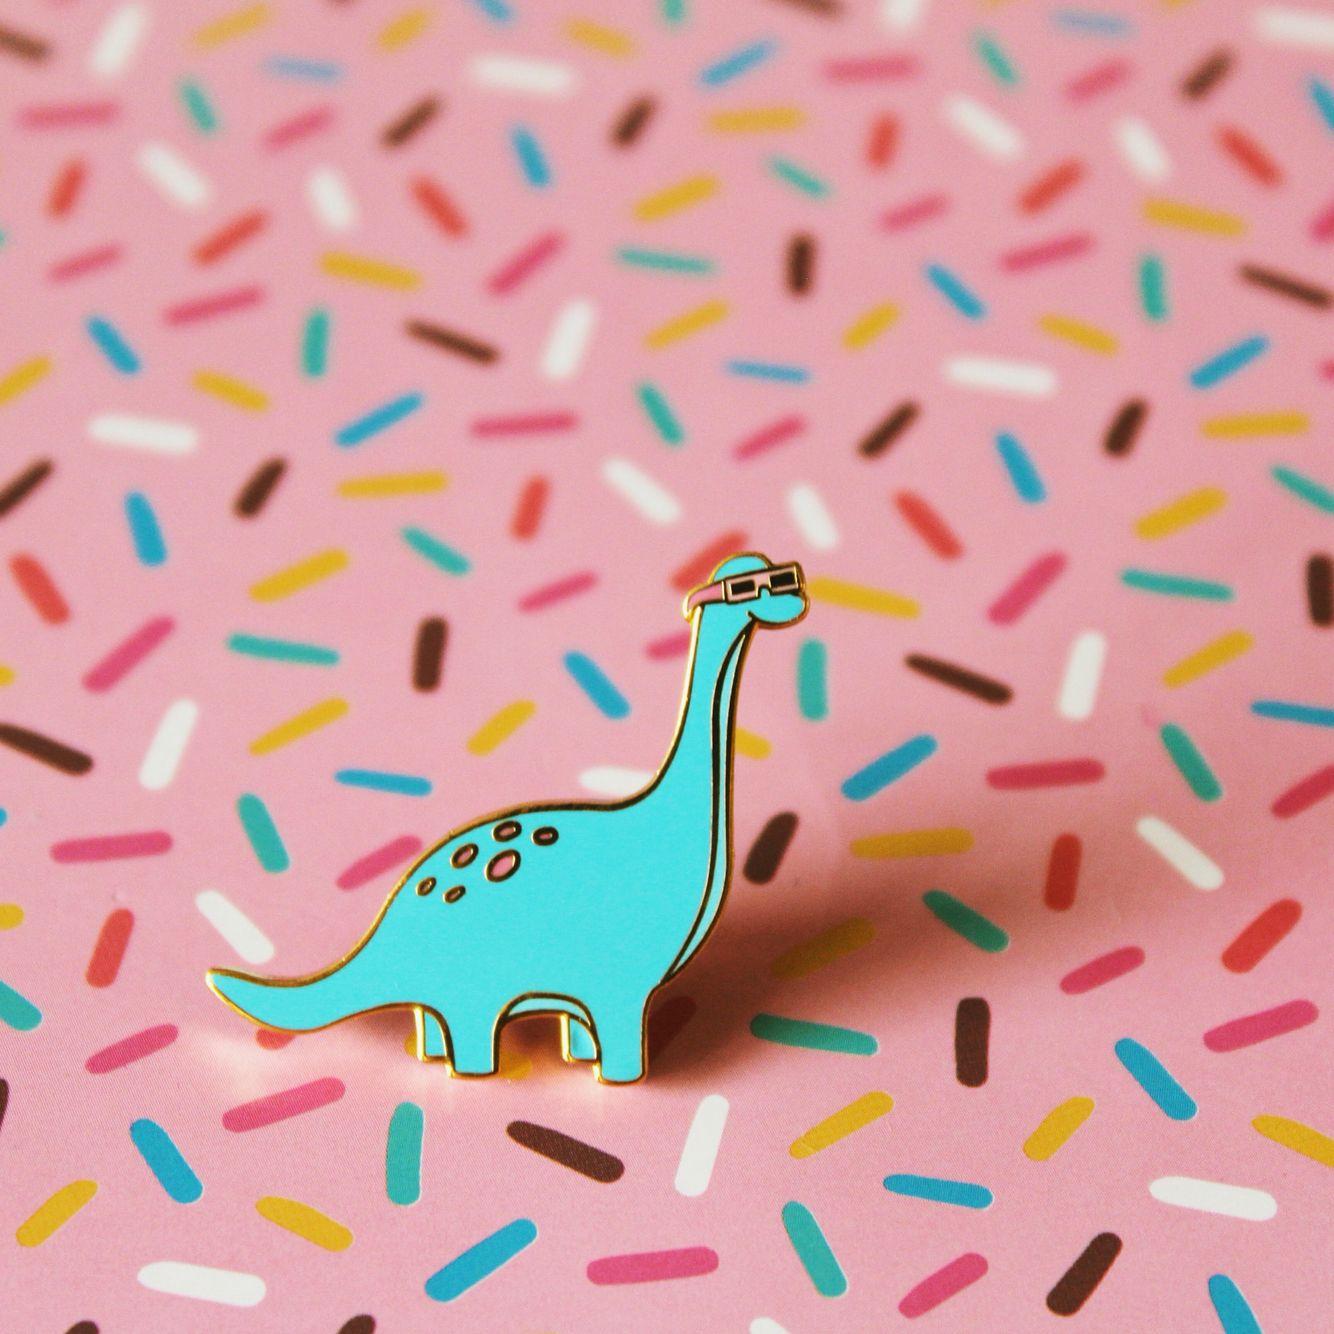 Hard Enamel Gold Lapel Pin Dinosaur With Sunglasses. For